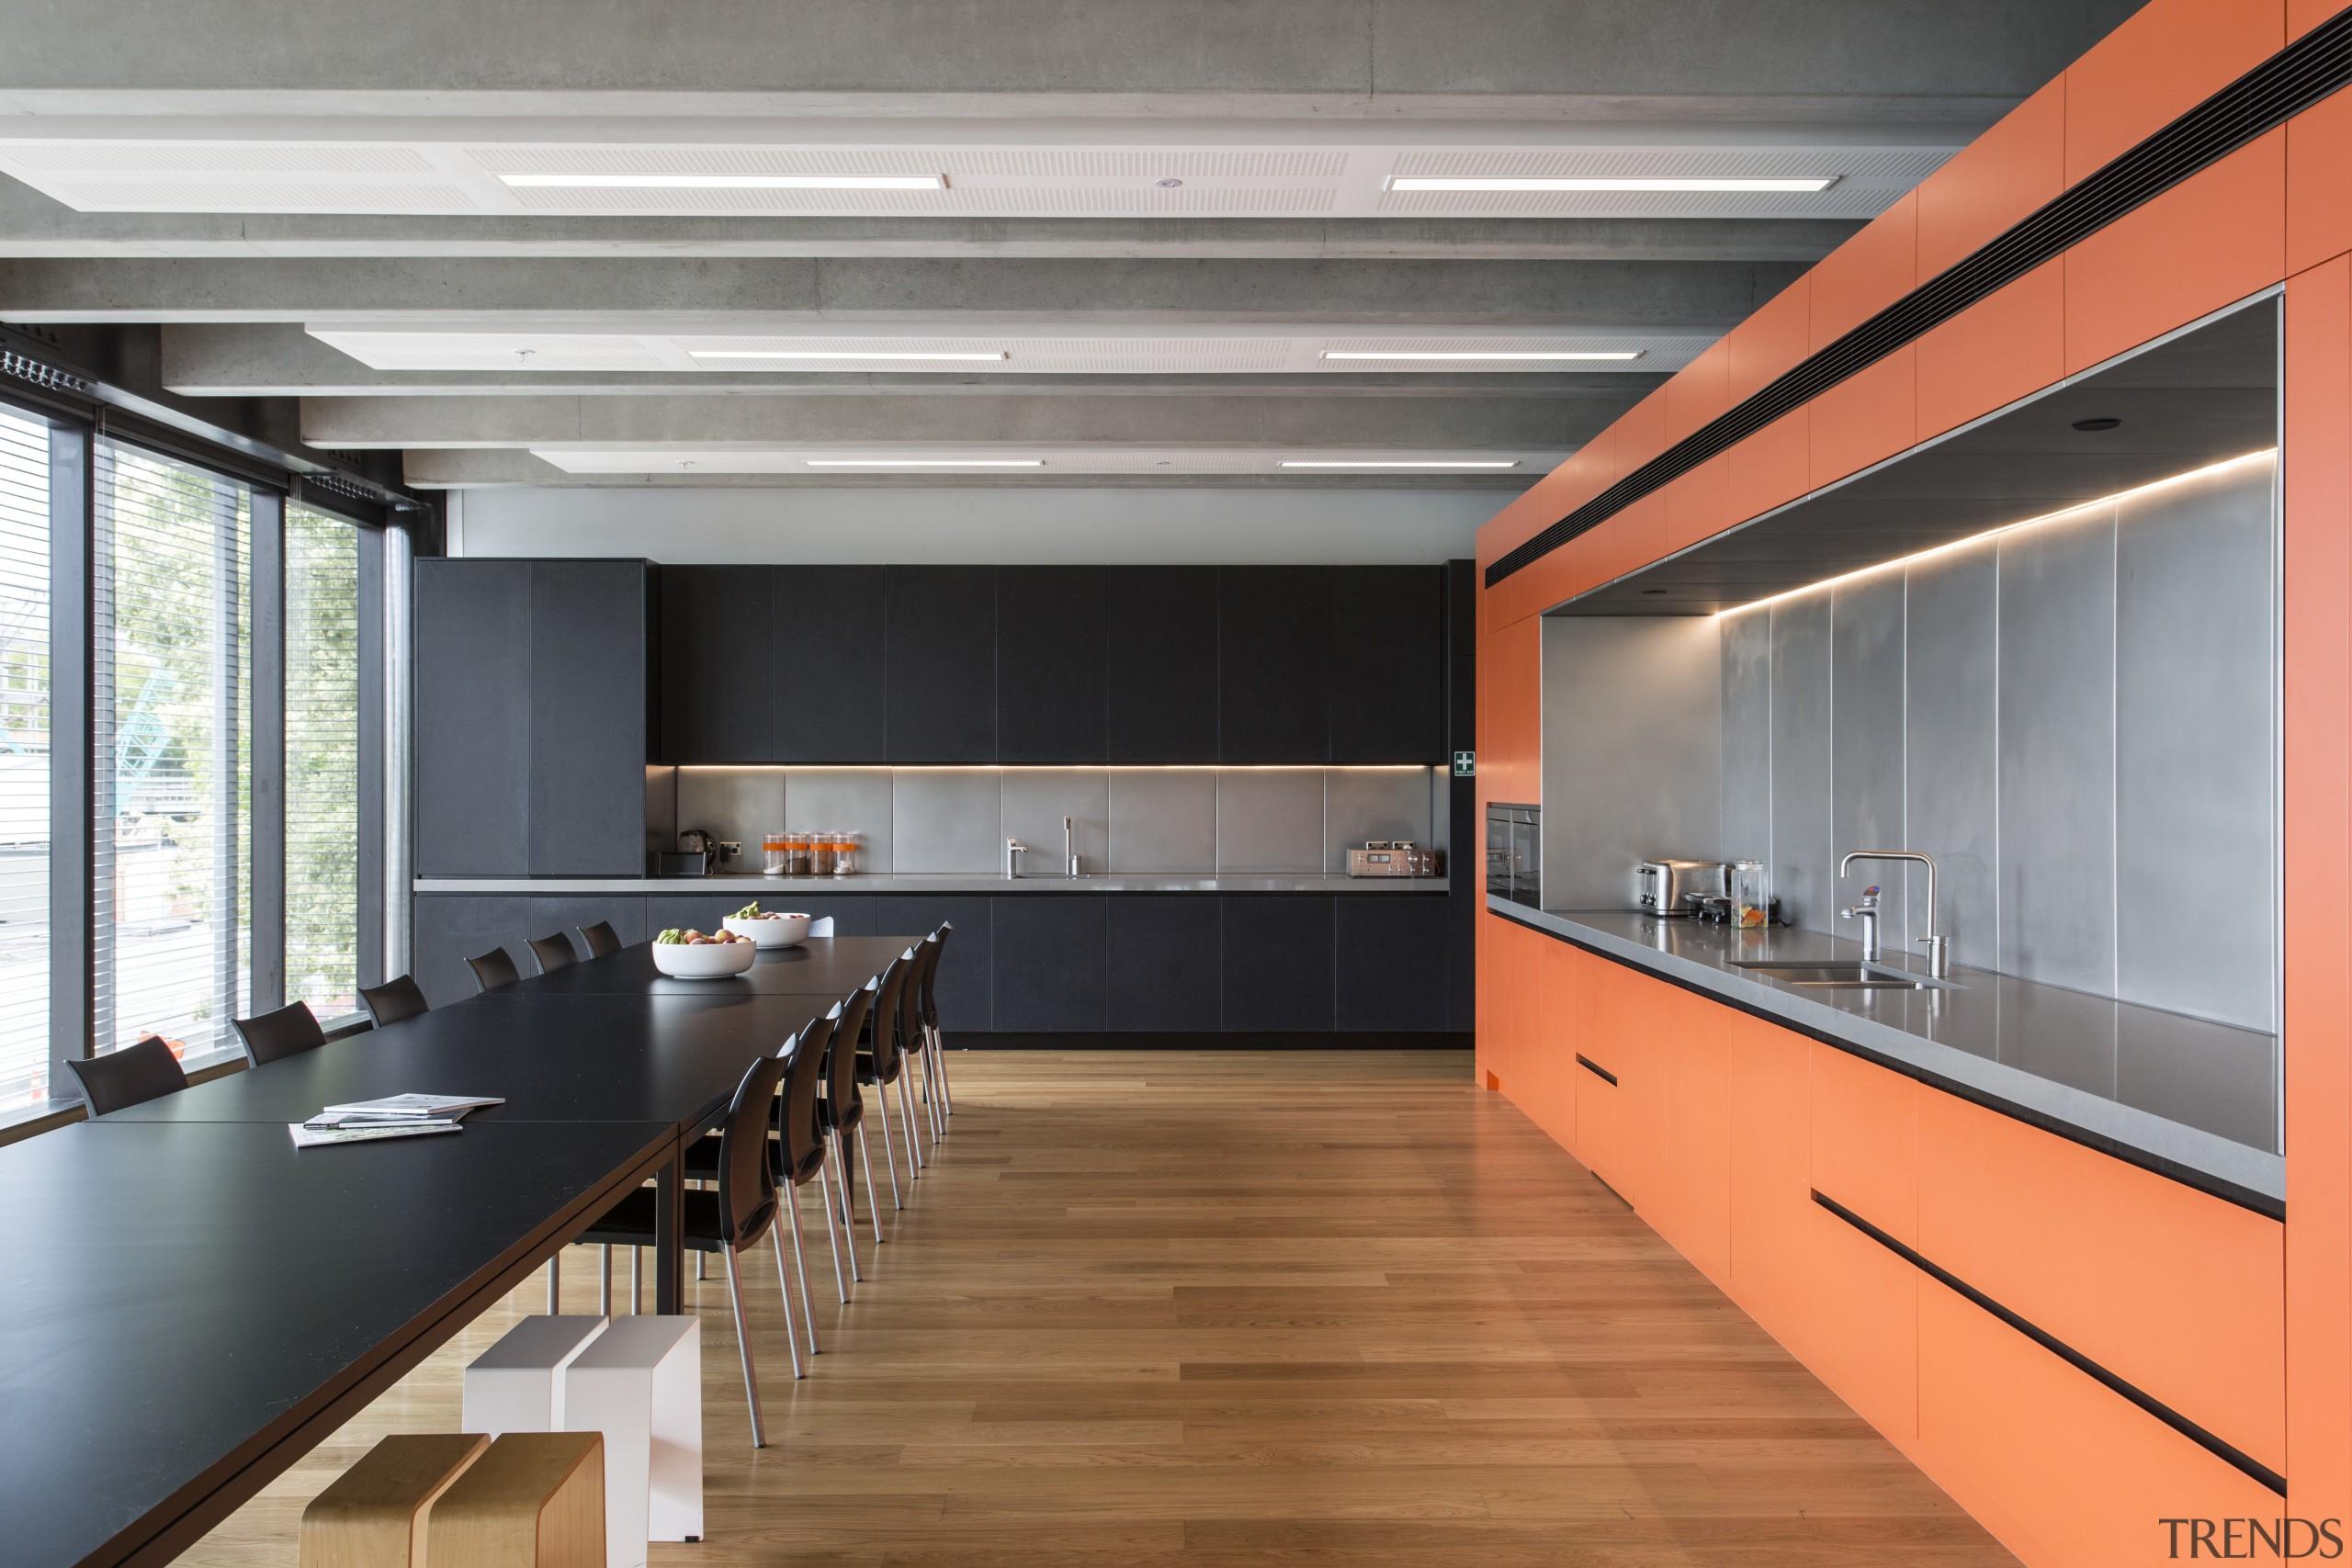 In Warren and Mahoneys own studio, the staff architecture, ceiling, interior design, gray